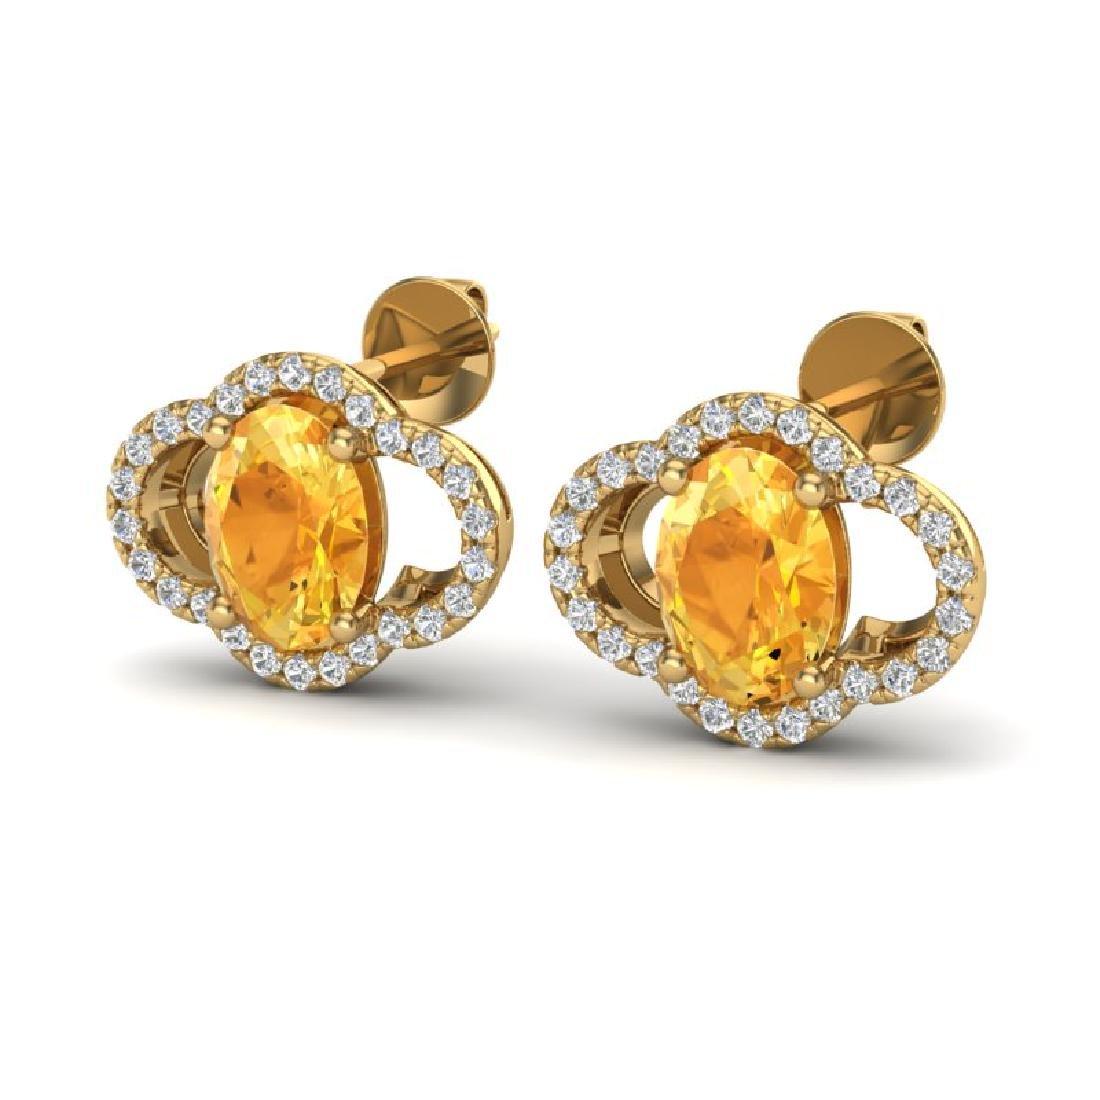 3.50 CTW Citrine & Micro Pave VS/SI Diamond Earrings